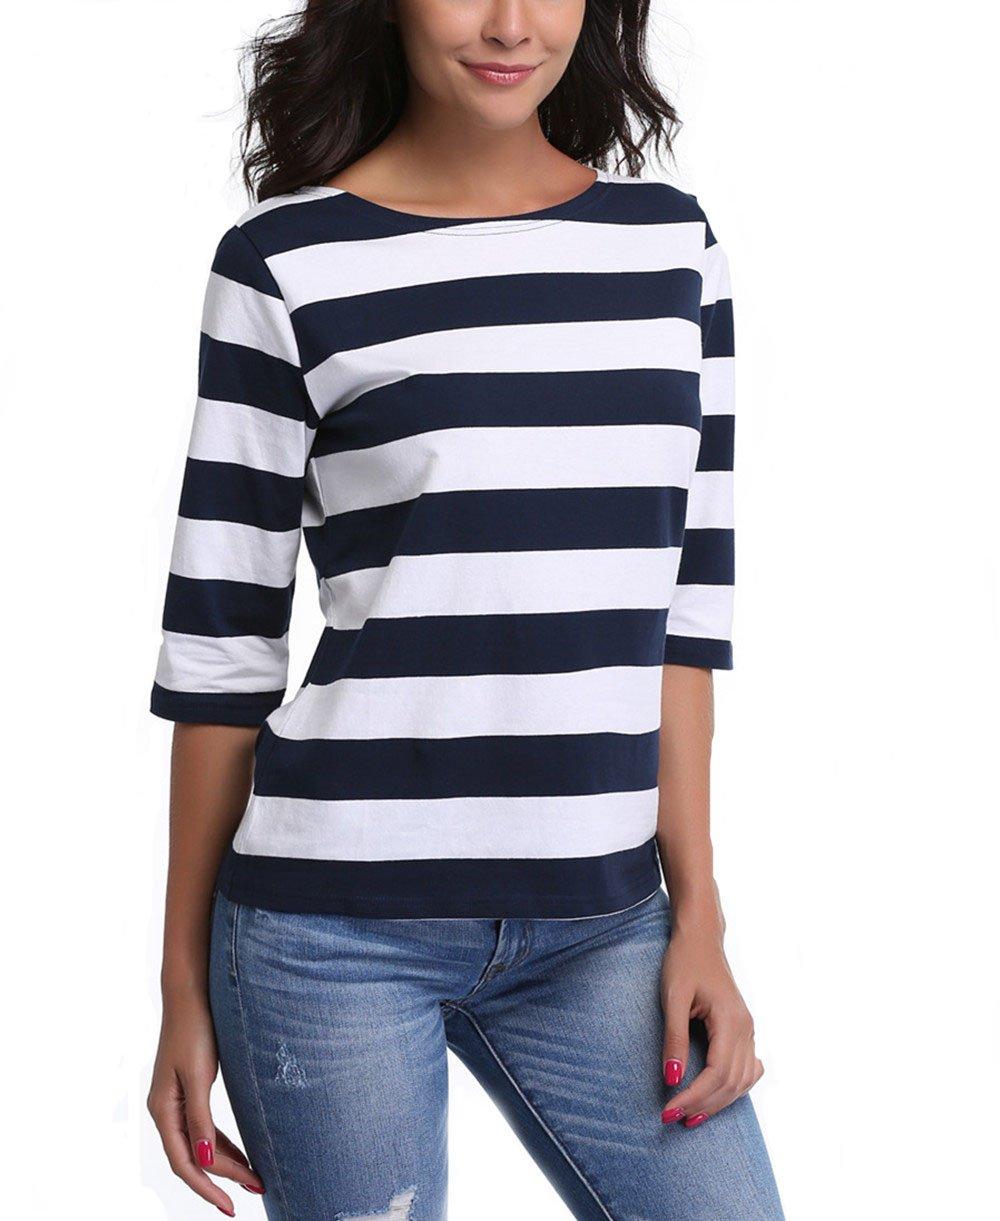 MISS MOLY SHIRT レディース B0756QVNHK S|Dark Blue Large Stripe Dark Blue Large Stripe S